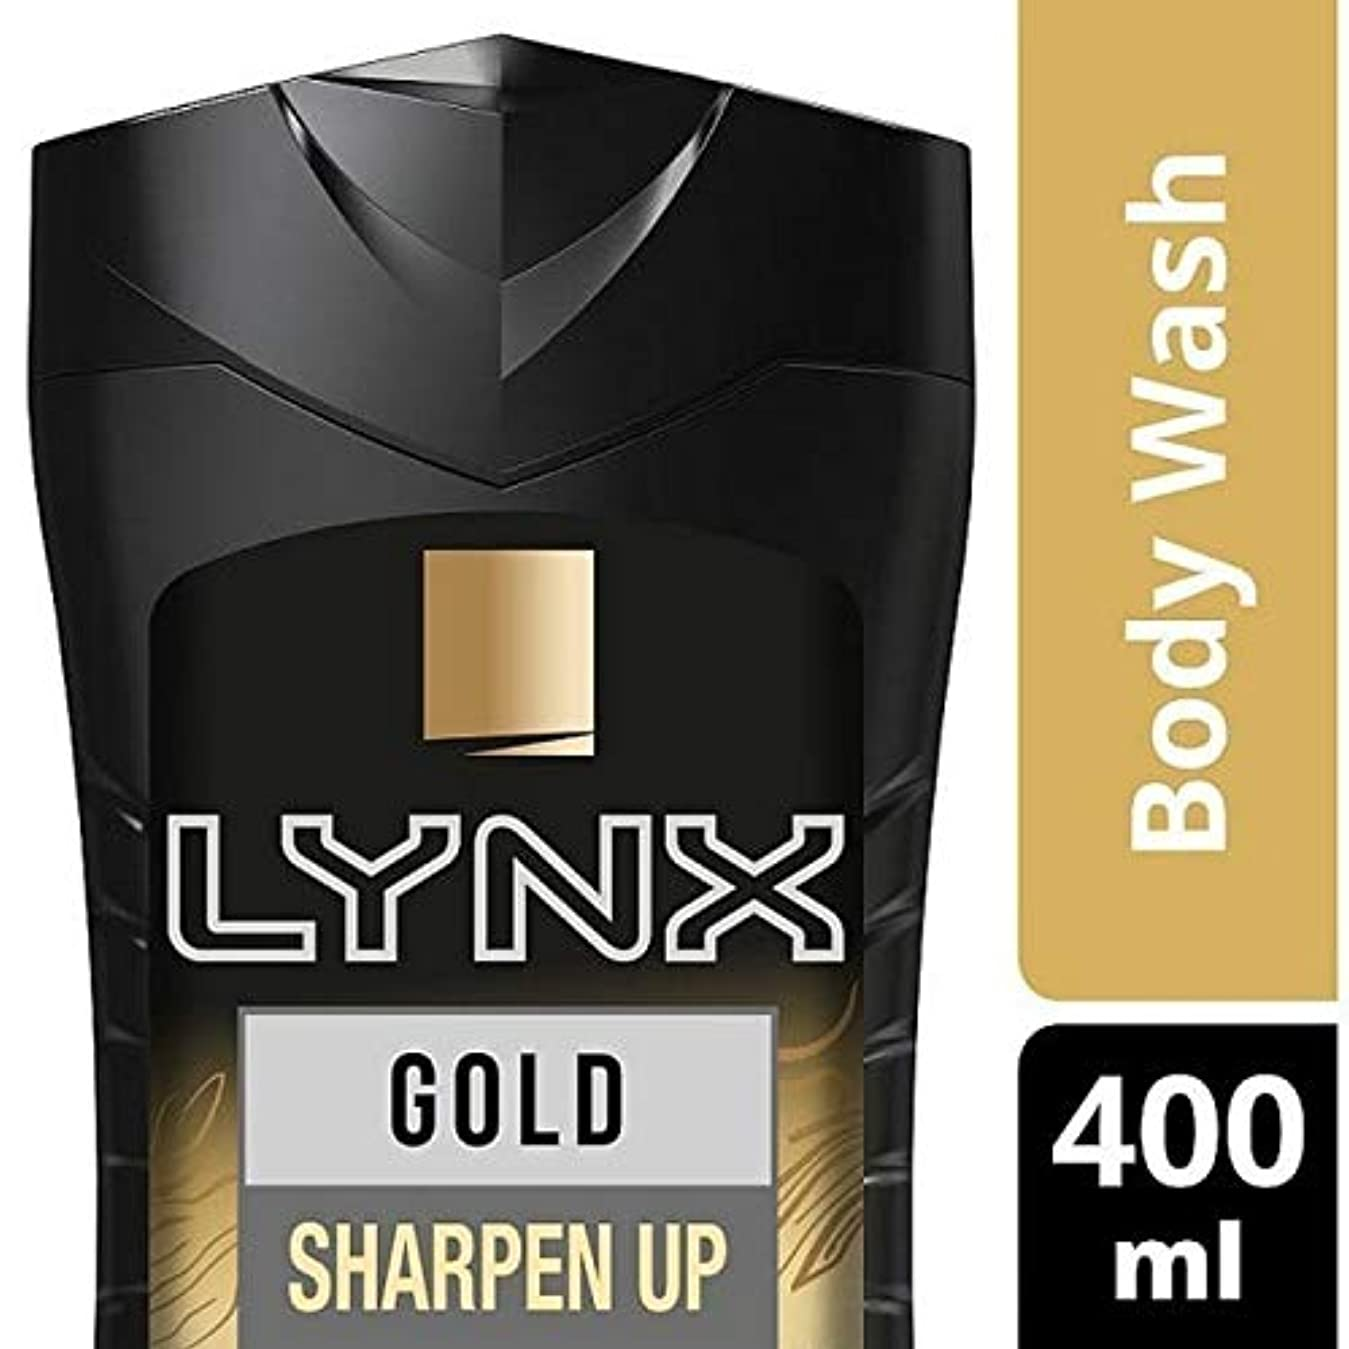 [Lynx ] オオヤマネコの金Oudwood&バニラシャワージェル400ミリリットル - Lynx Gold Oudwood & Vanilla Shower Gel 400ml [並行輸入品]